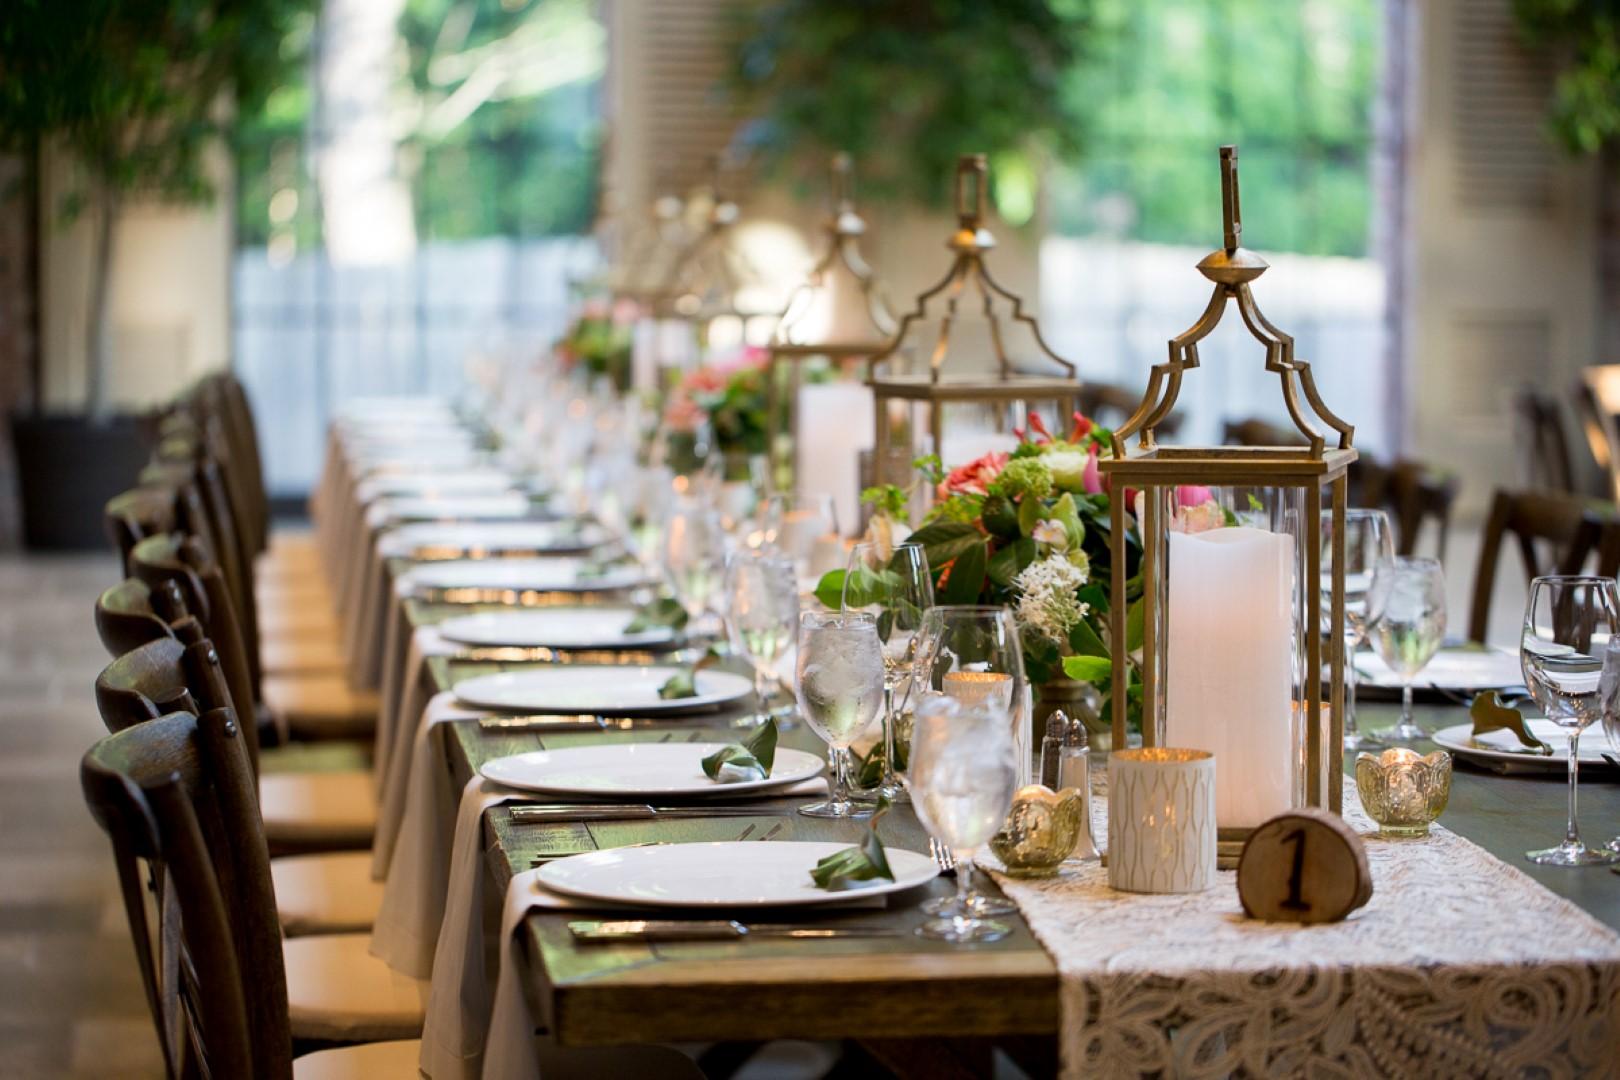 ANN & MORGAN_Rehersal Dinner-Sarah Jane Sanders-WEBB c2017-61 (Large).jpg